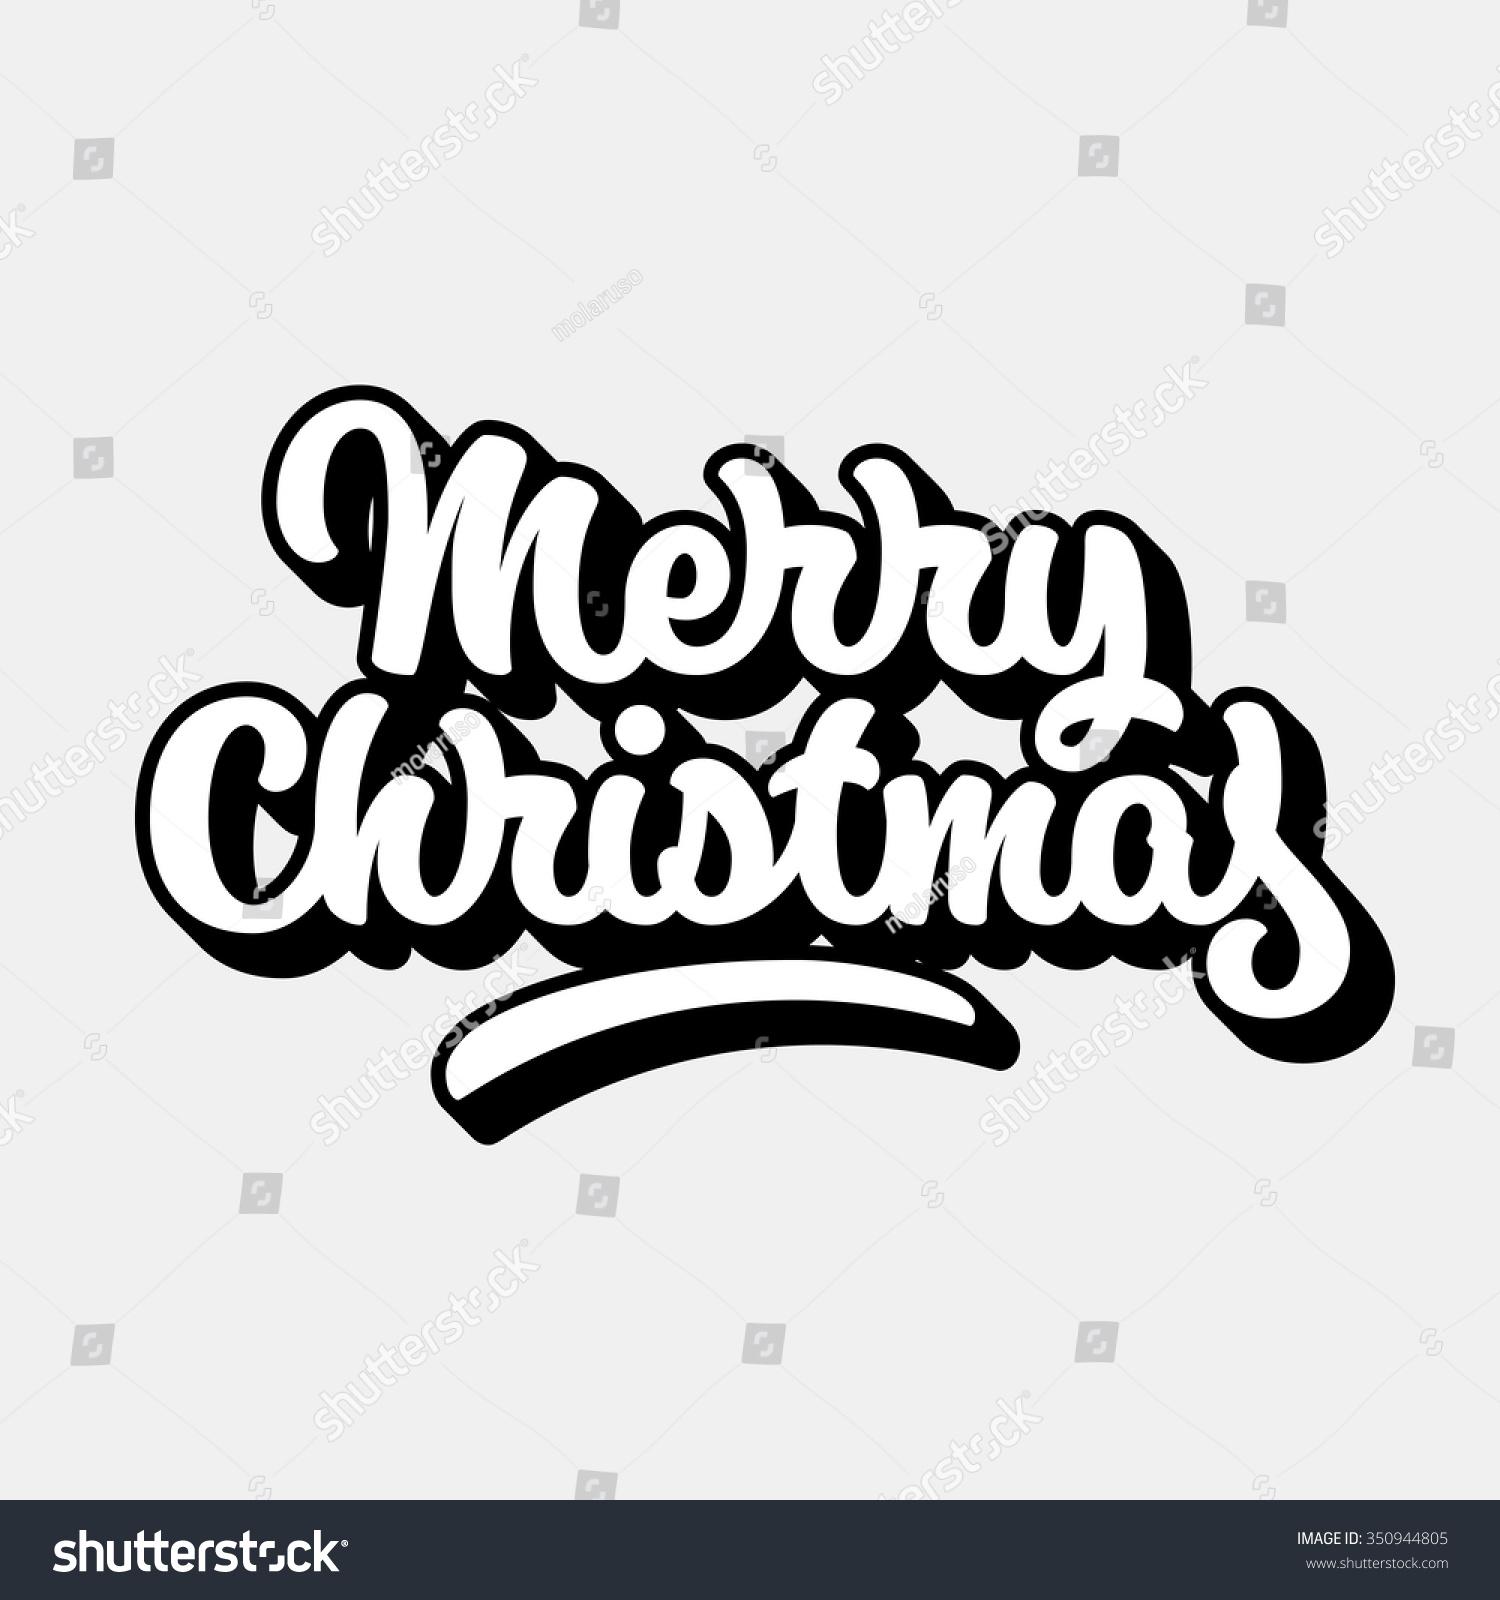 Merry Christmas Xmas Badge Handwritten Lettering Stock